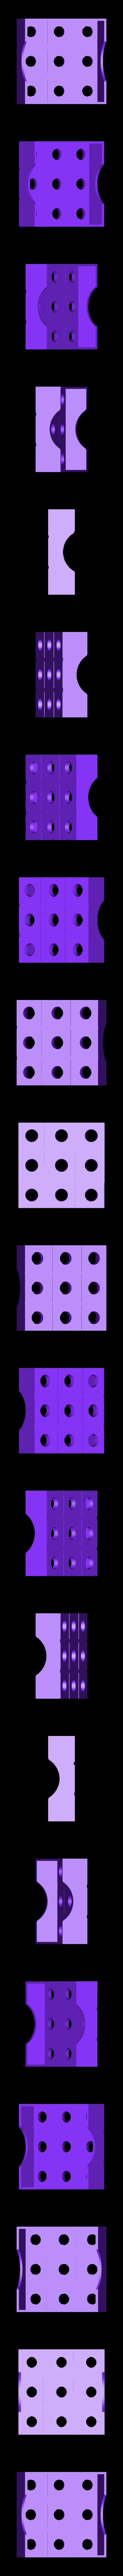 dessus.stl Download free STL file Morpion game • 3D printing model, Boxplyer